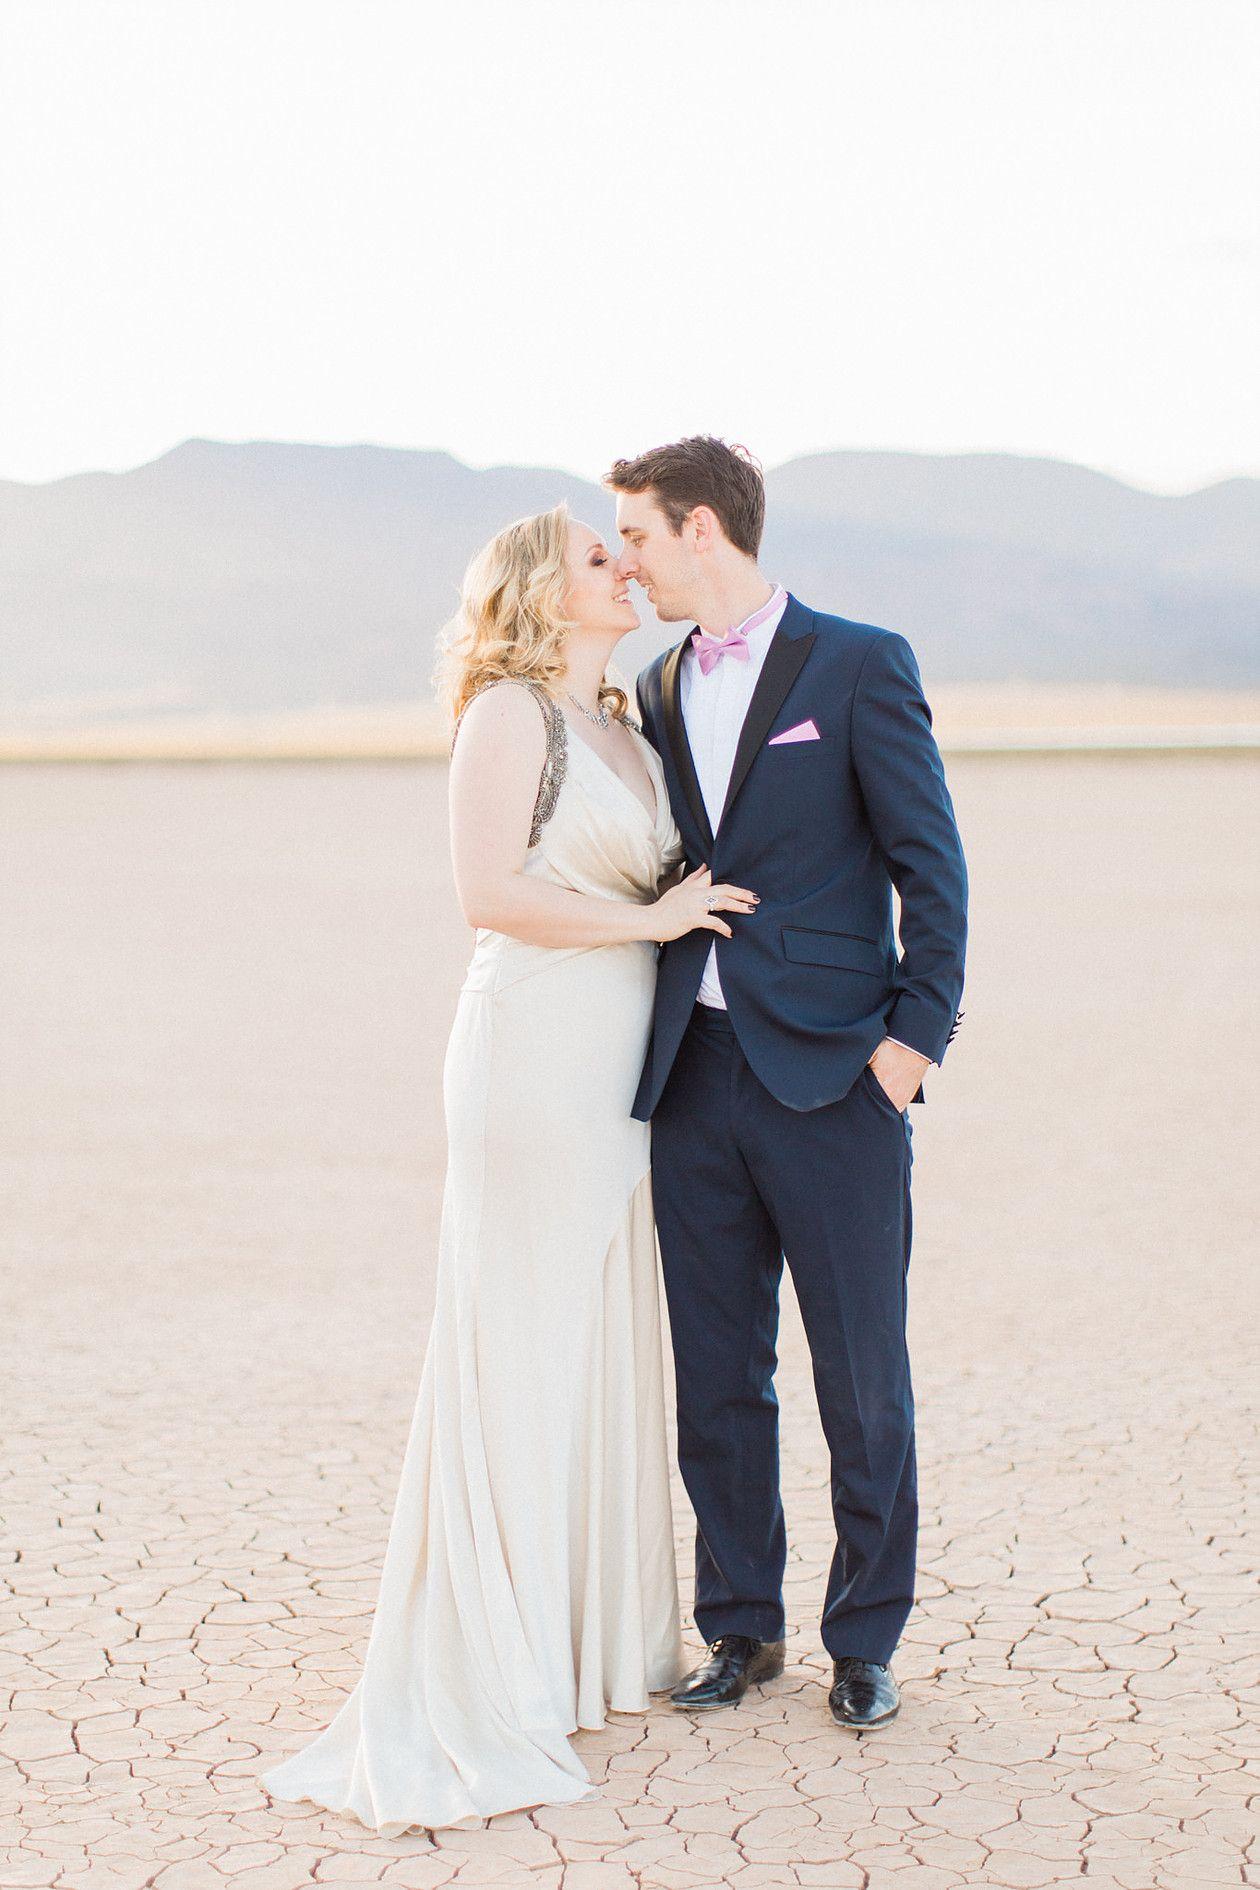 Dry Lakebed Wedding Elopement Las Vegas